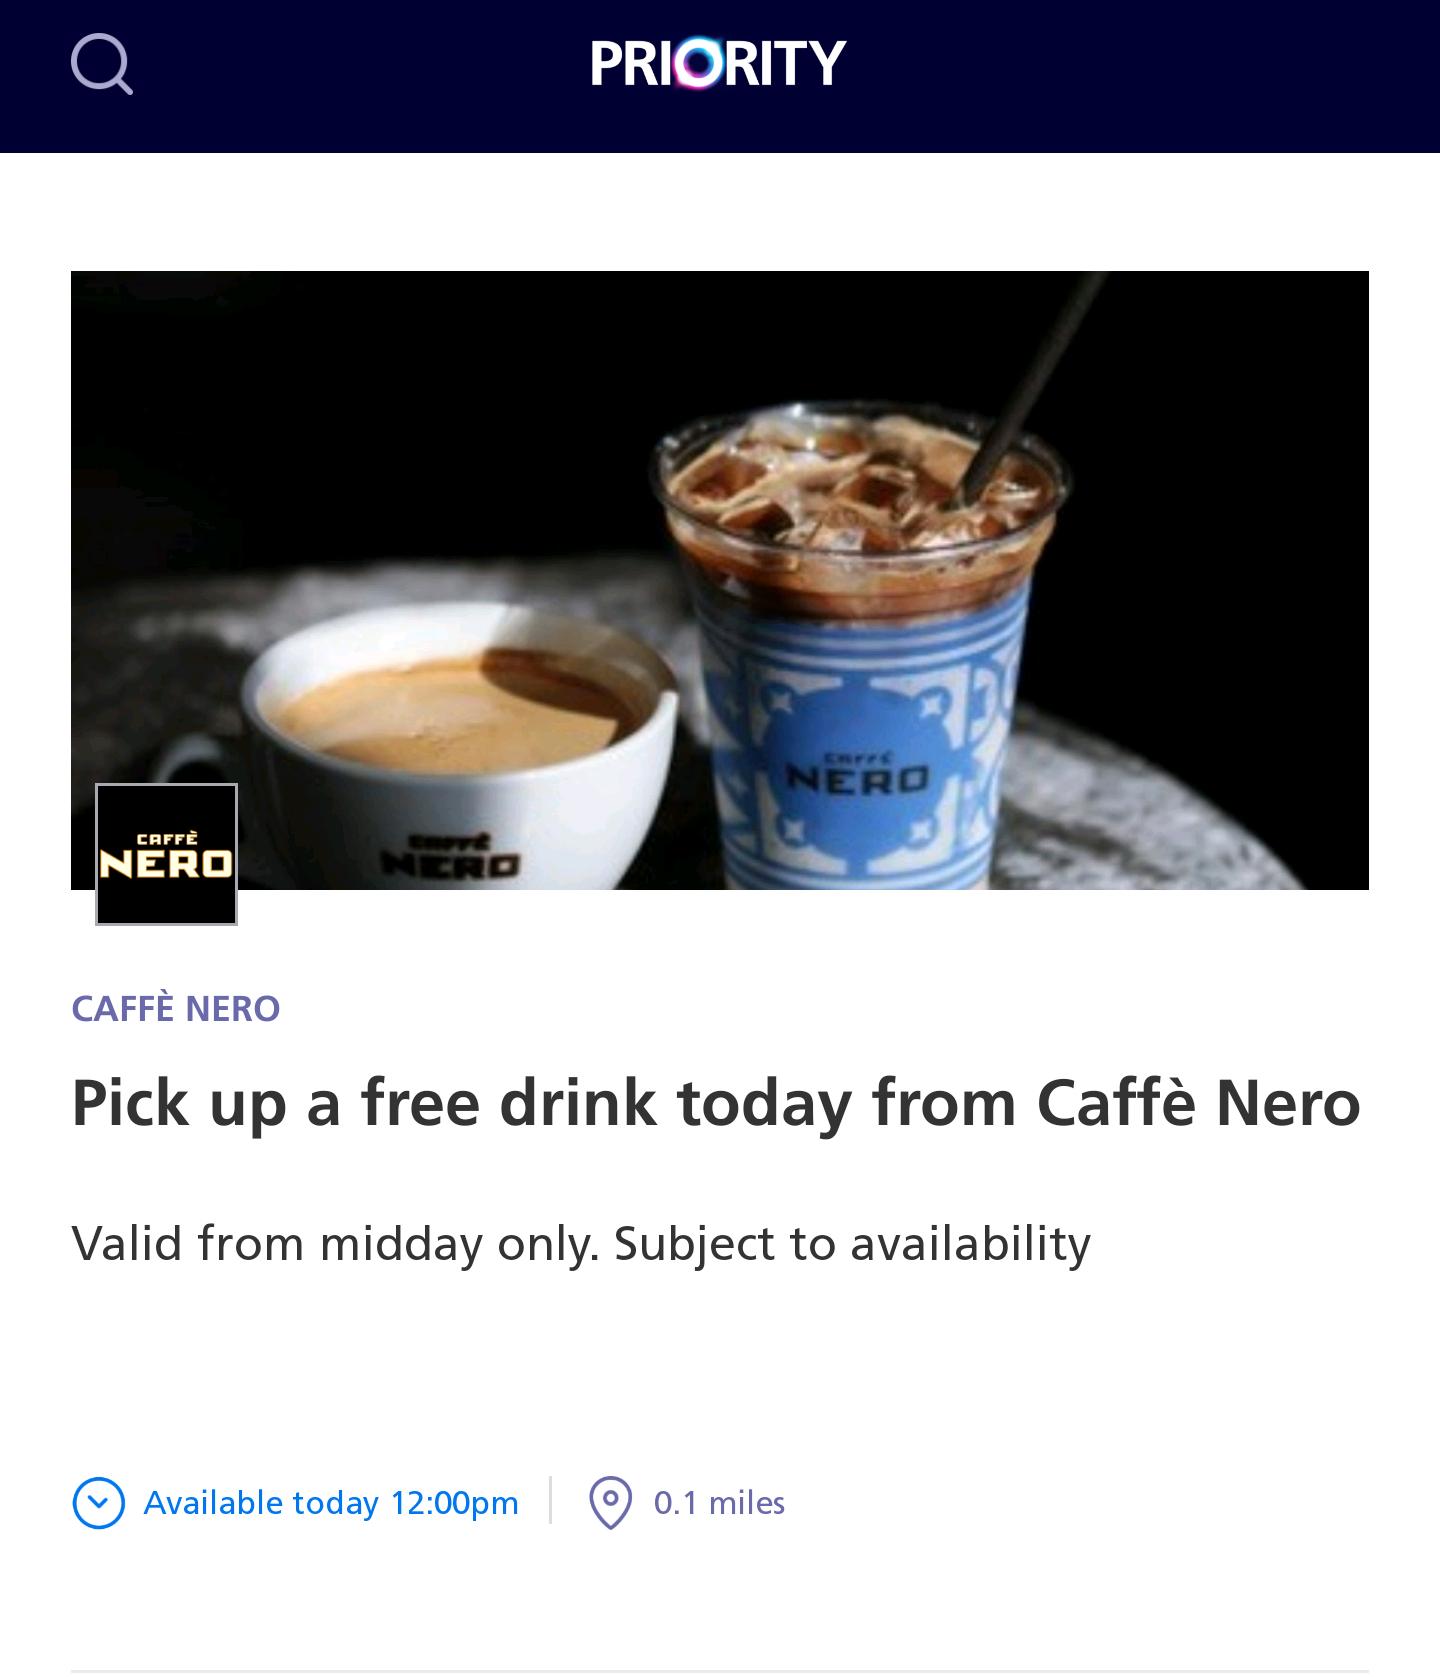 Free drink from Caffe Nero via O2 Priority